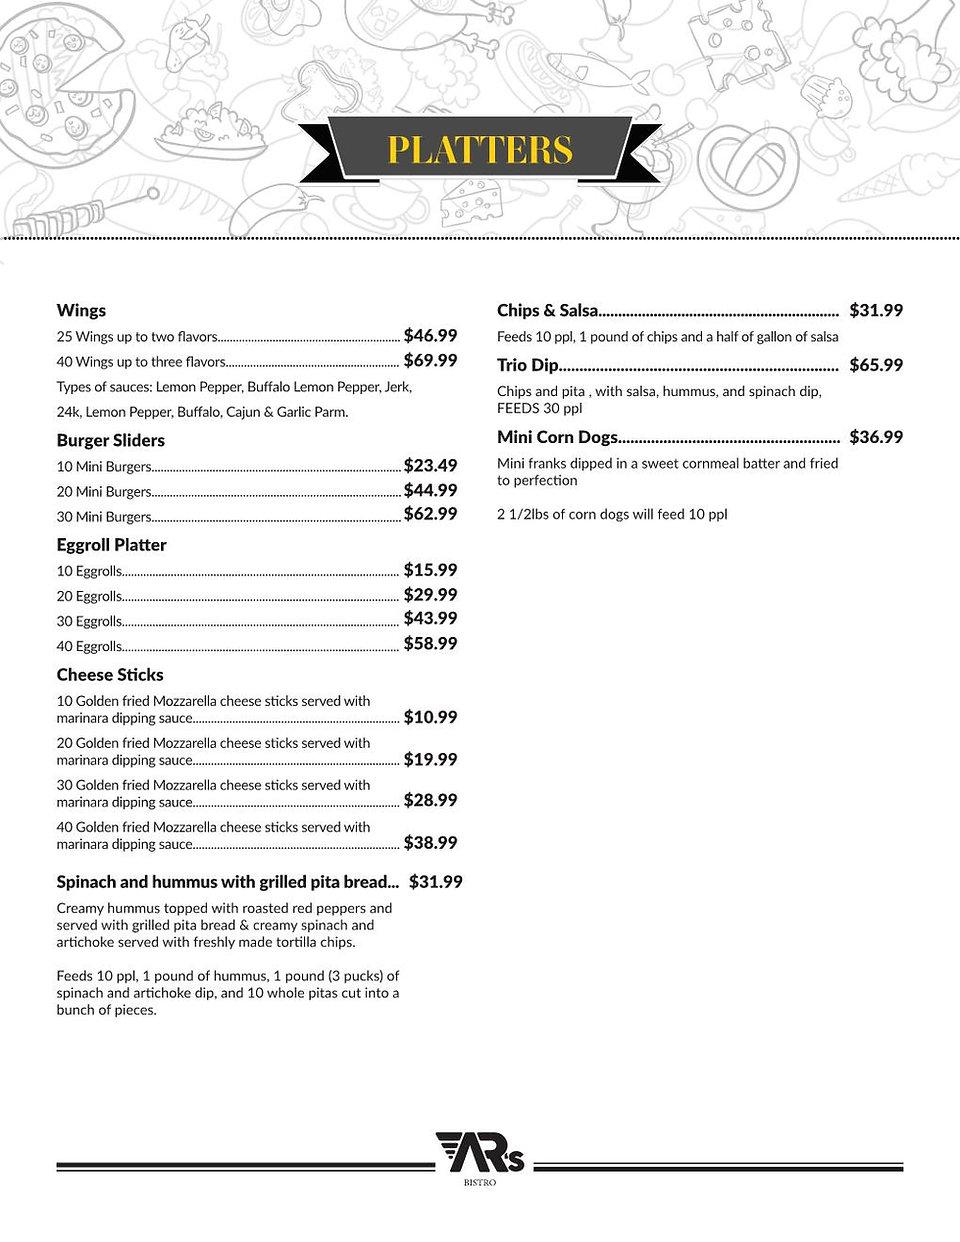 AR_restaurant_MAR-19 Page 006.jpg